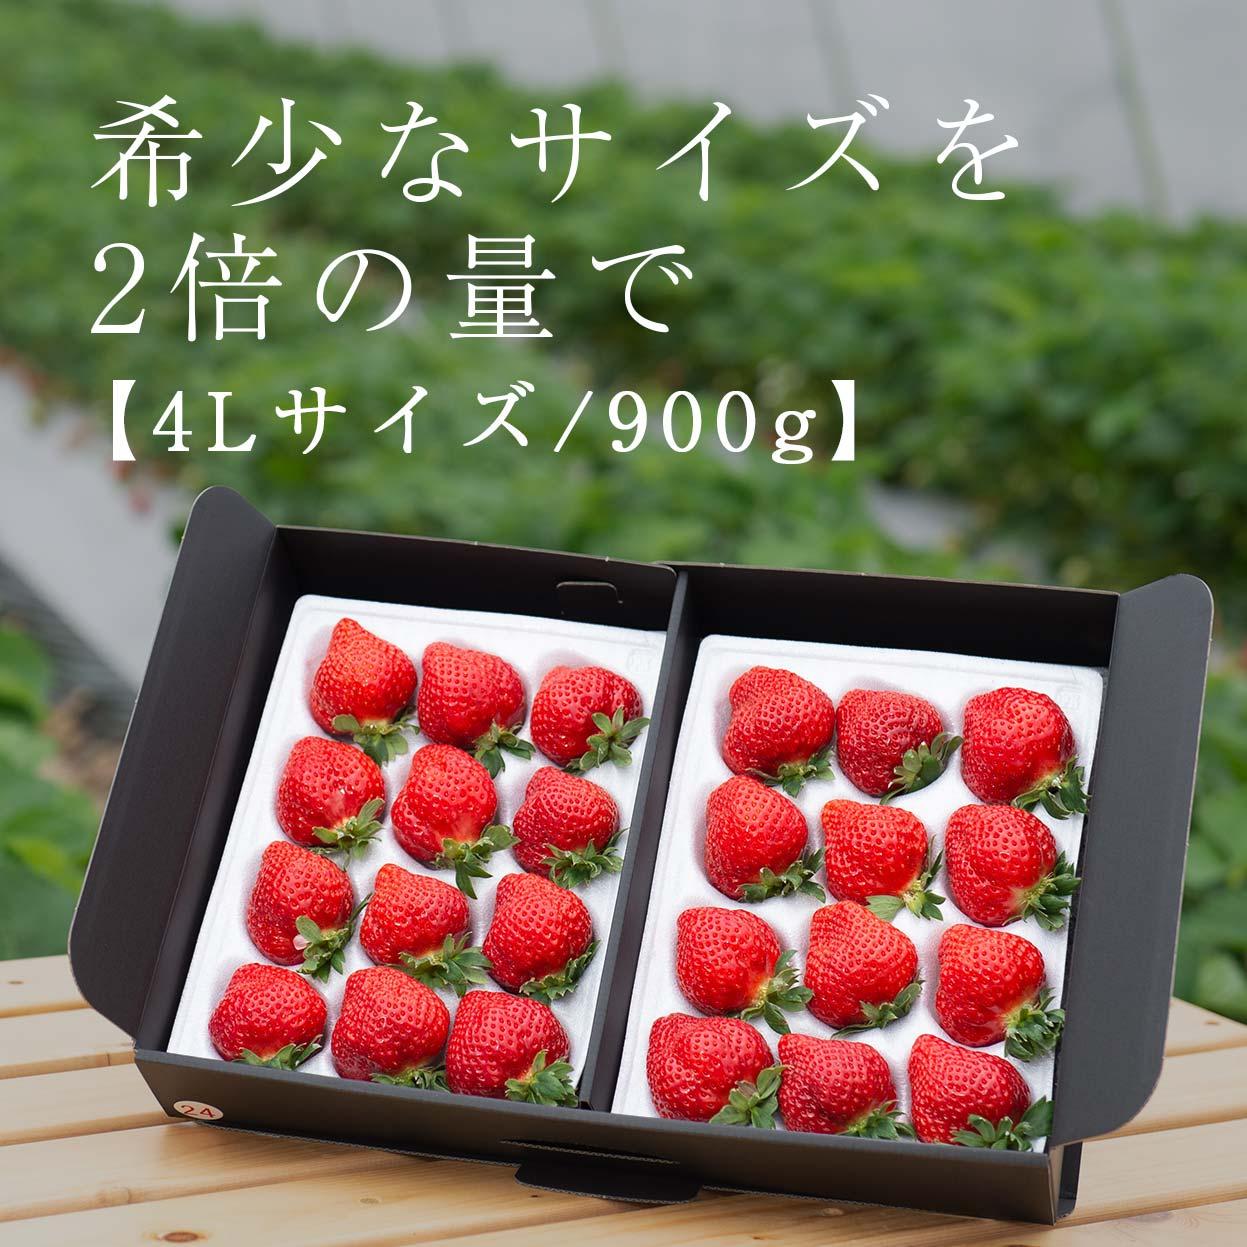 生果4L/900g